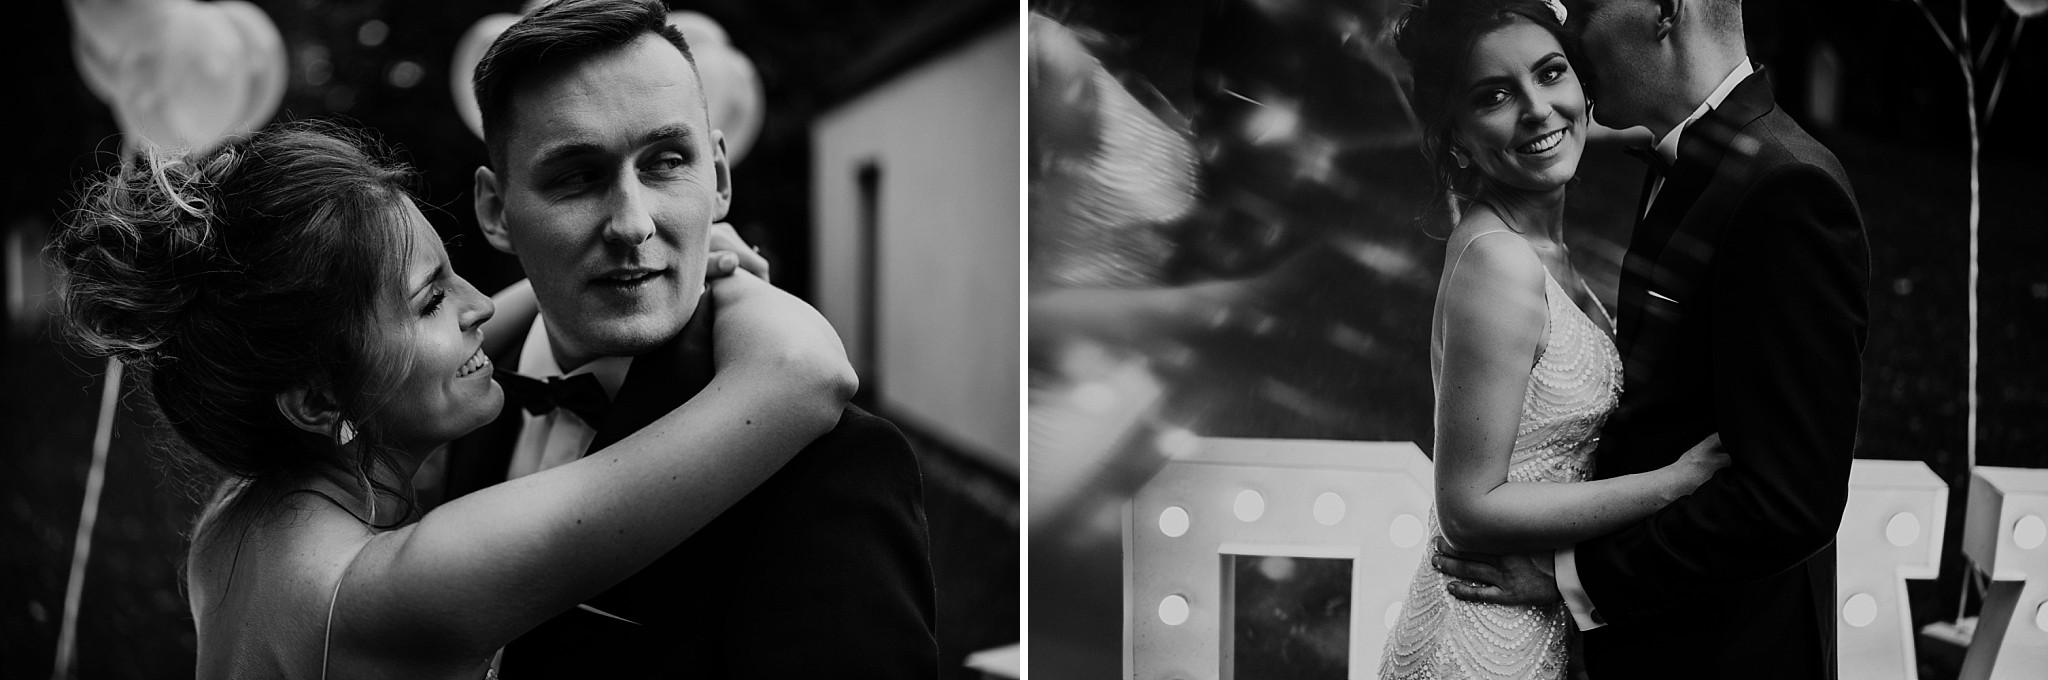 fotograf poznan wesele dobra truskawka piekne wesele pod poznaniem wesele w dobrej truskawce piekna para mloda slub marzen slub koronawirus slub listopad wesele koronawirus 347